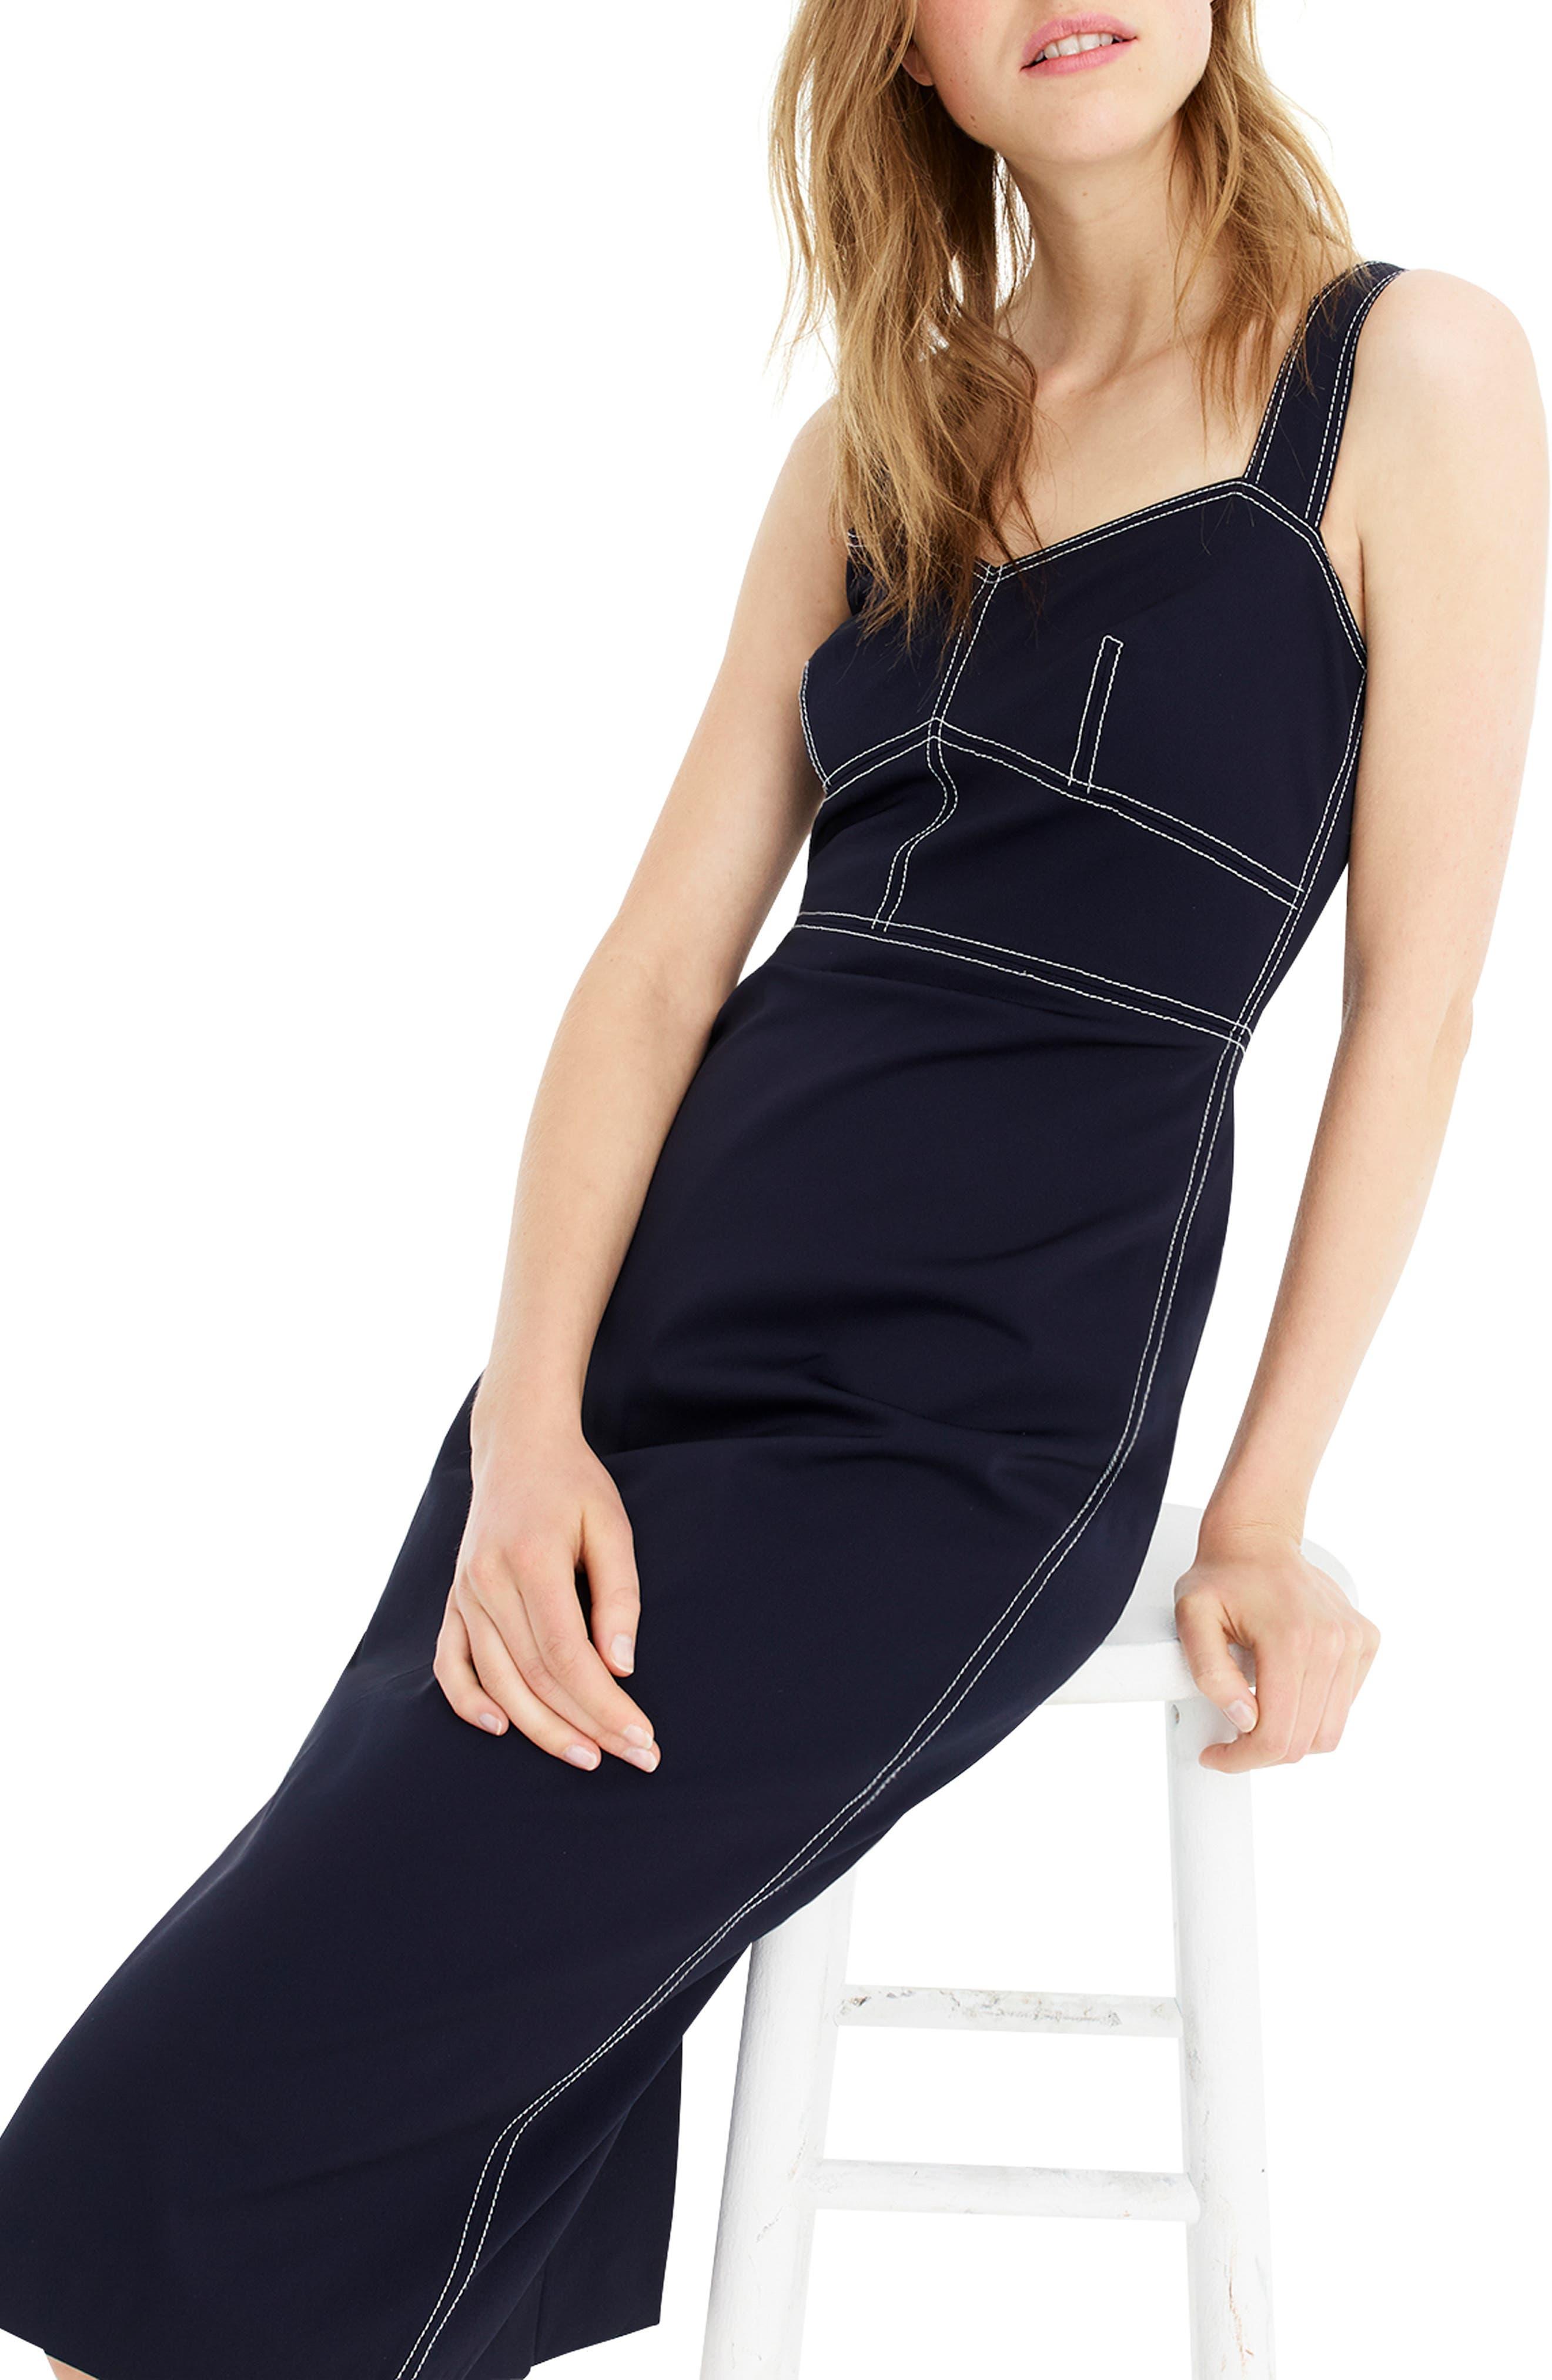 J.crew Contrast Stitch Stretch Faille Sheath Dress, Blue